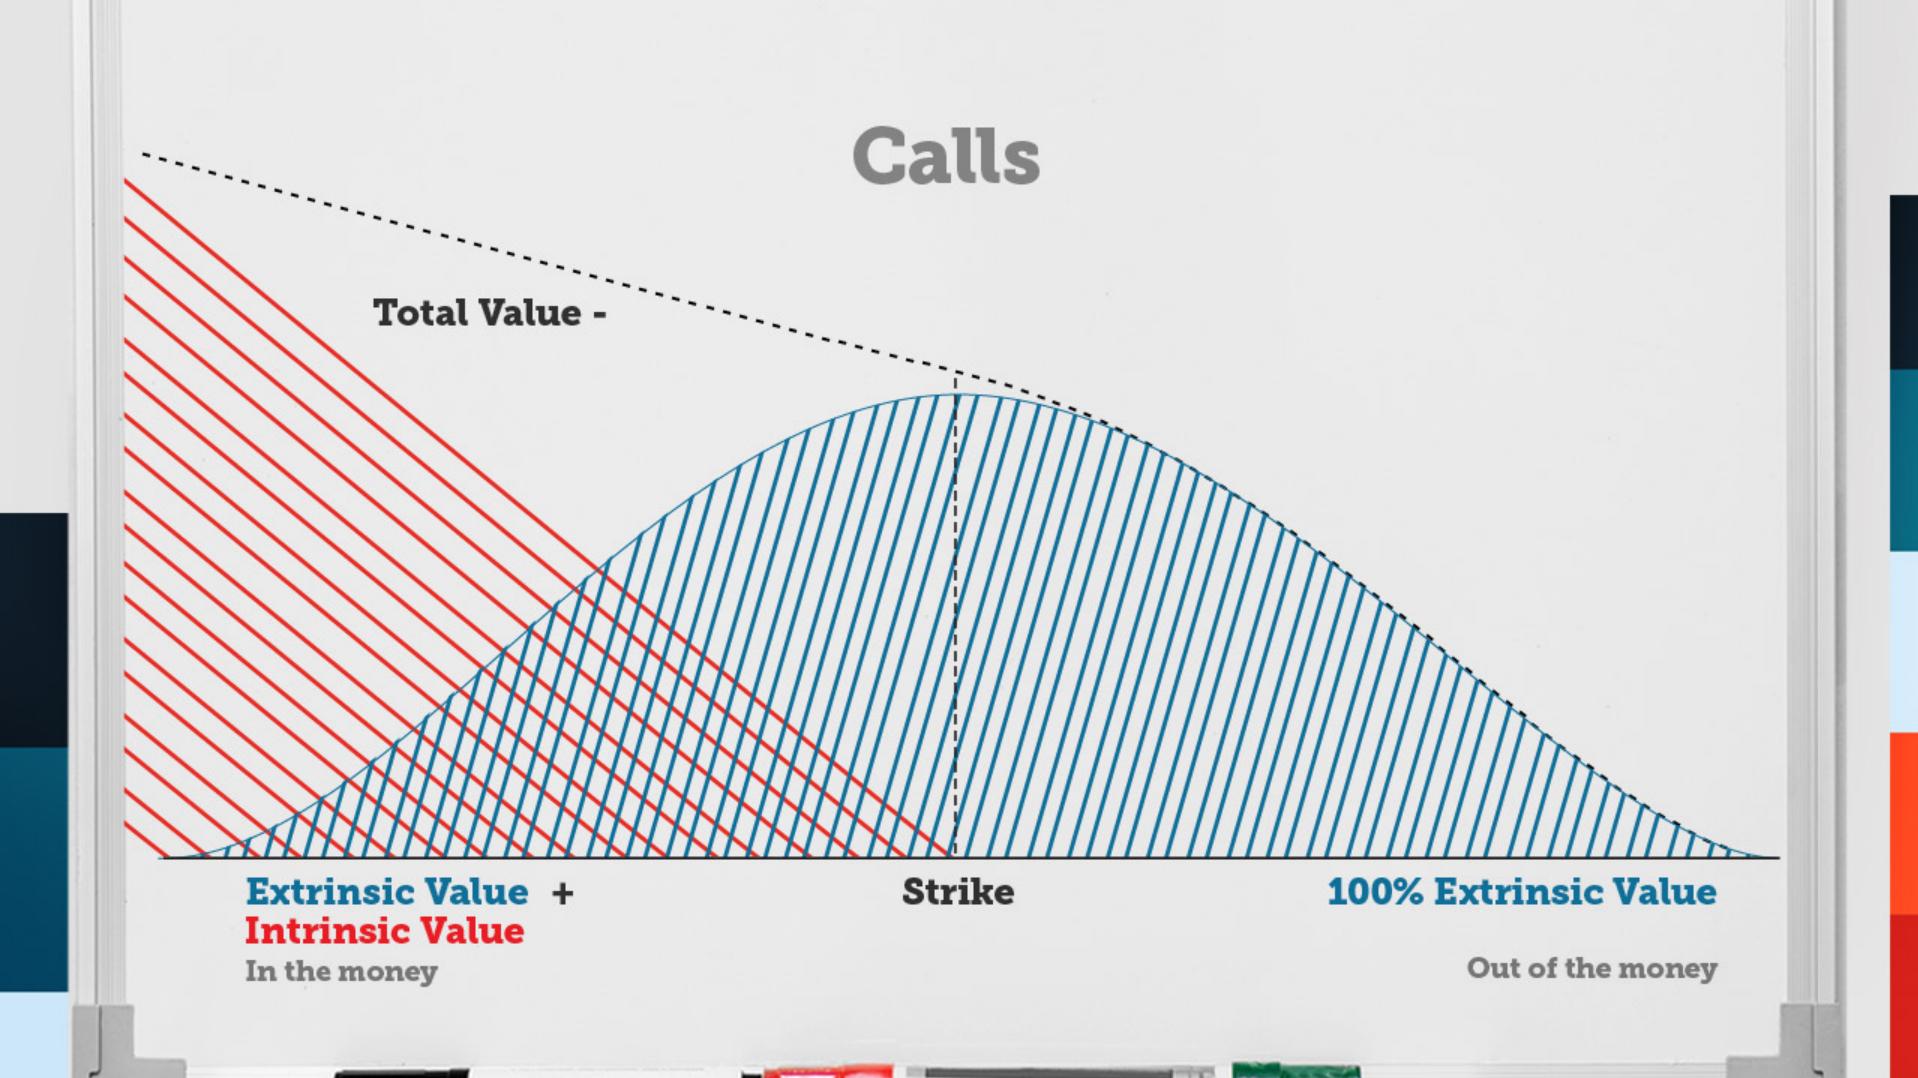 intrinsic-extrinsic-value-calls